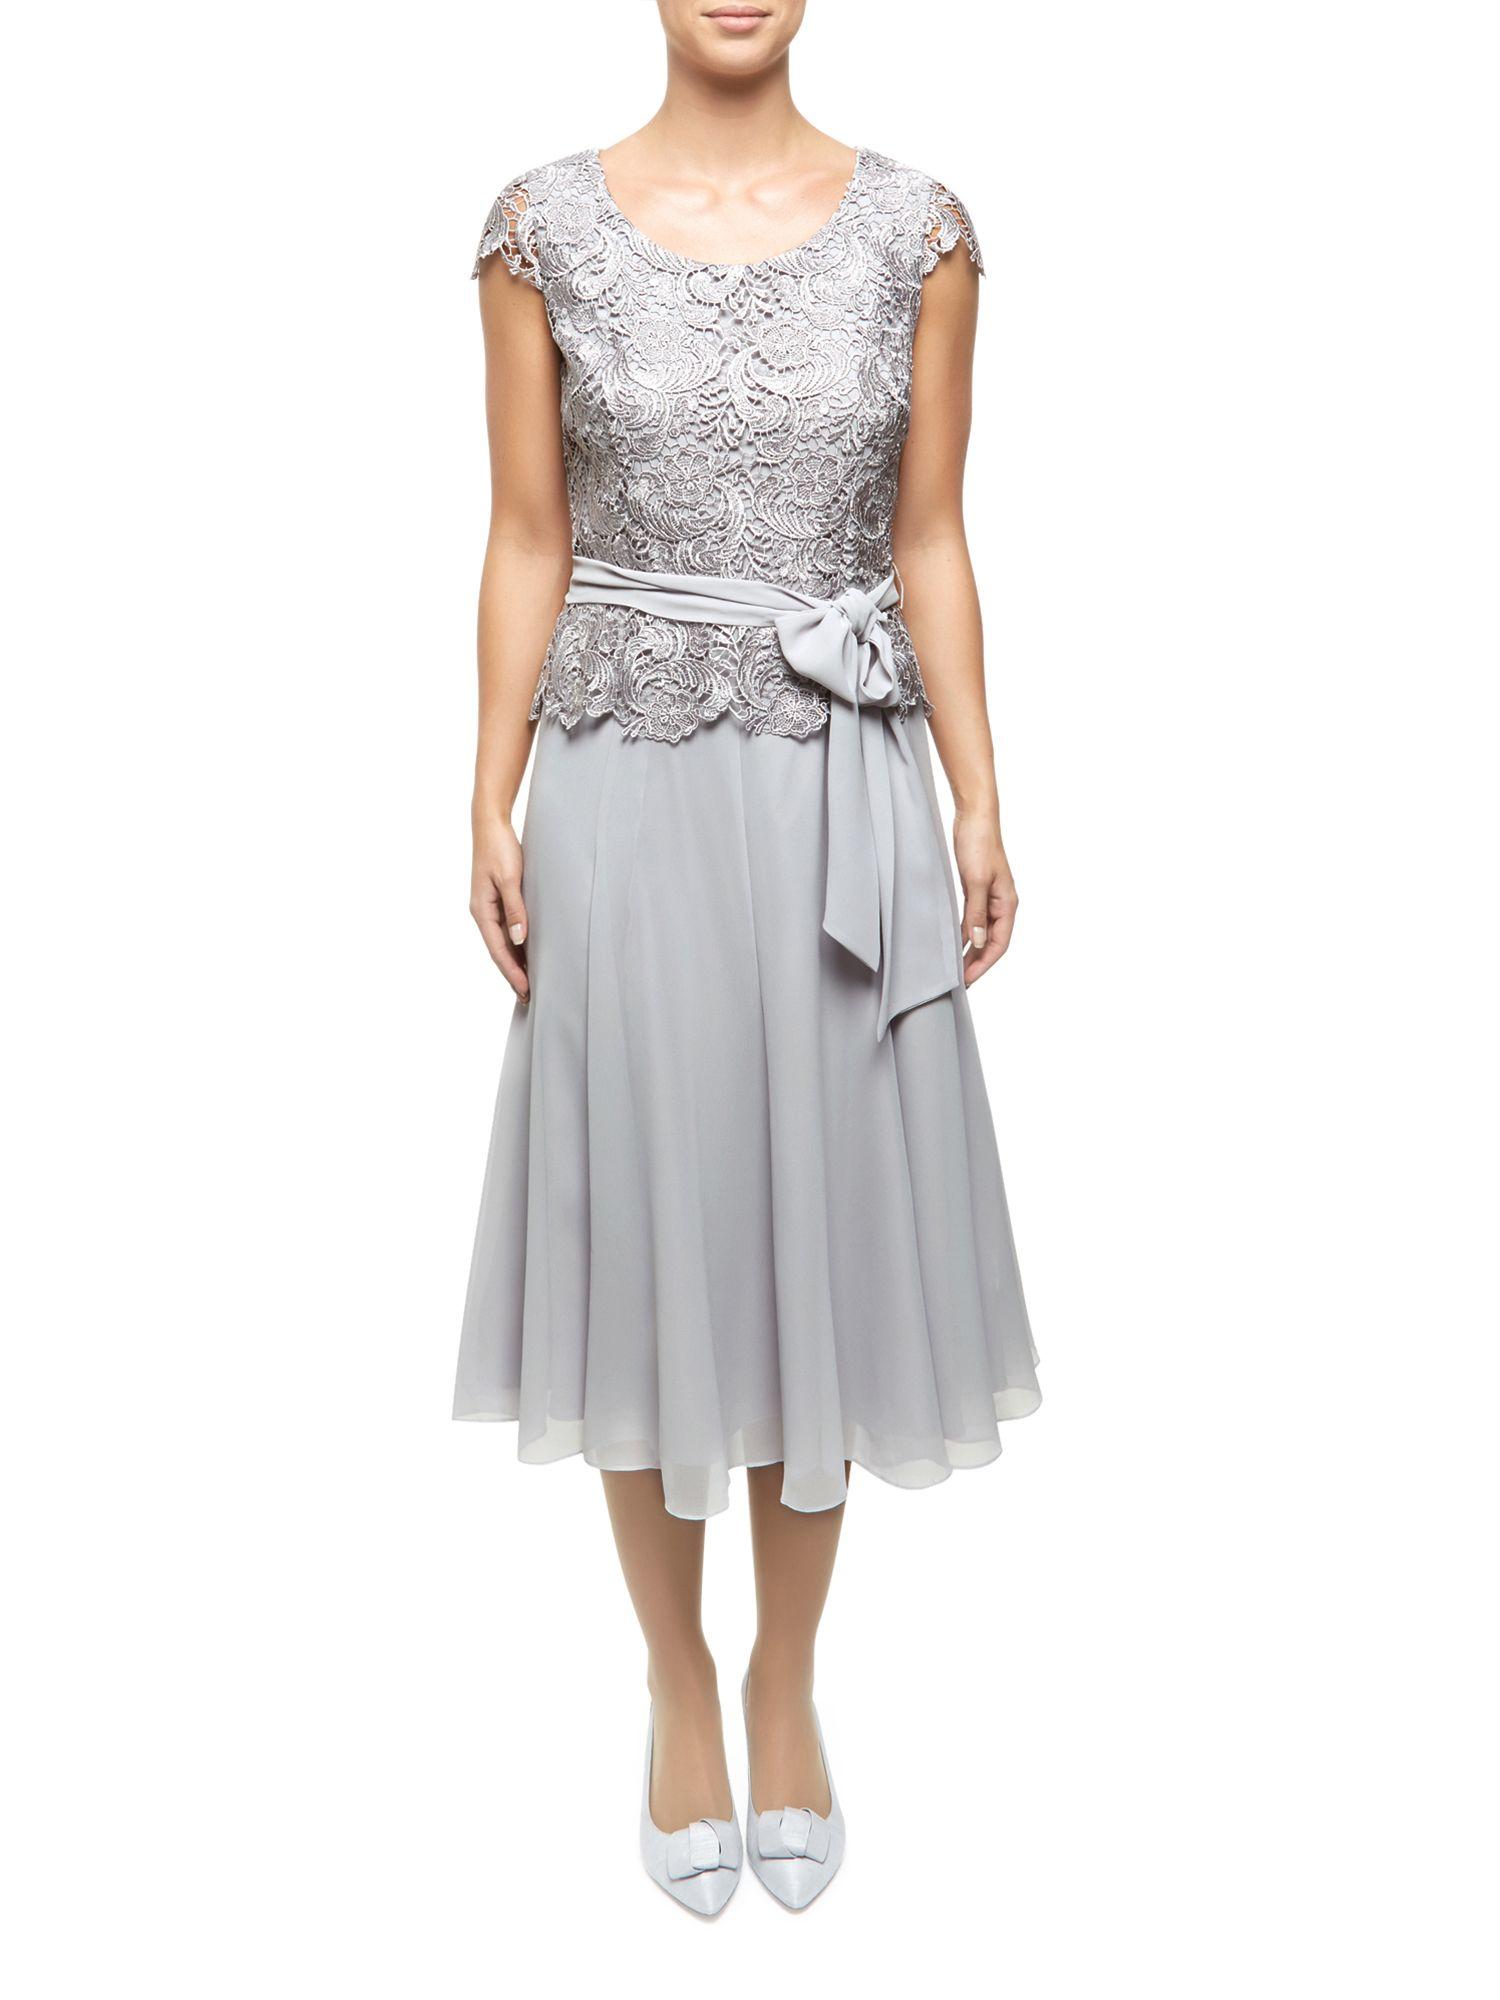 Jacques Vert Lace Bodice Chiffon Dress In Light Grey Gray